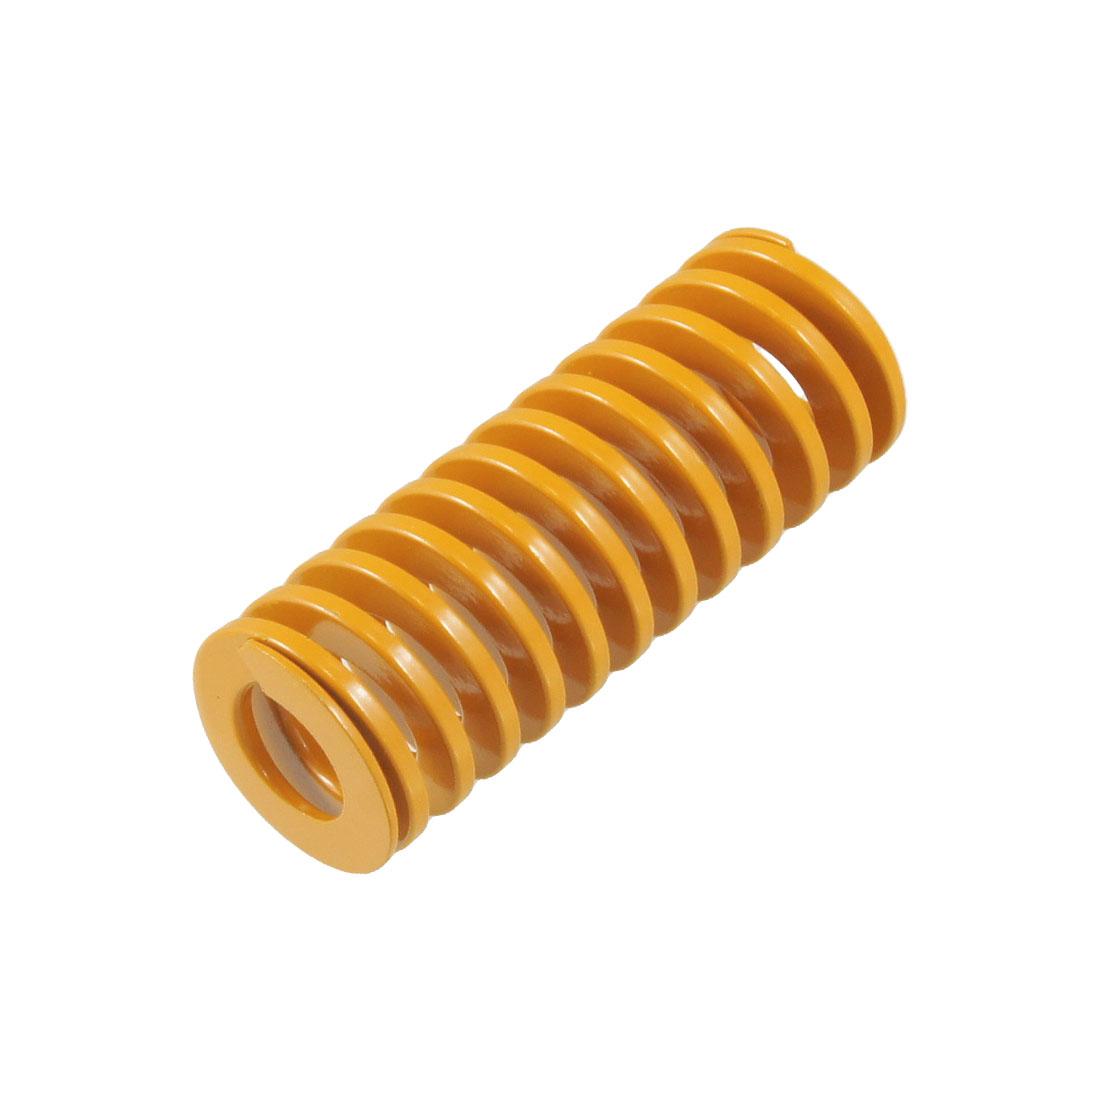 Orange 25mm x 13.5mm x 65mm Metal Tubular Section Mould Die Spring